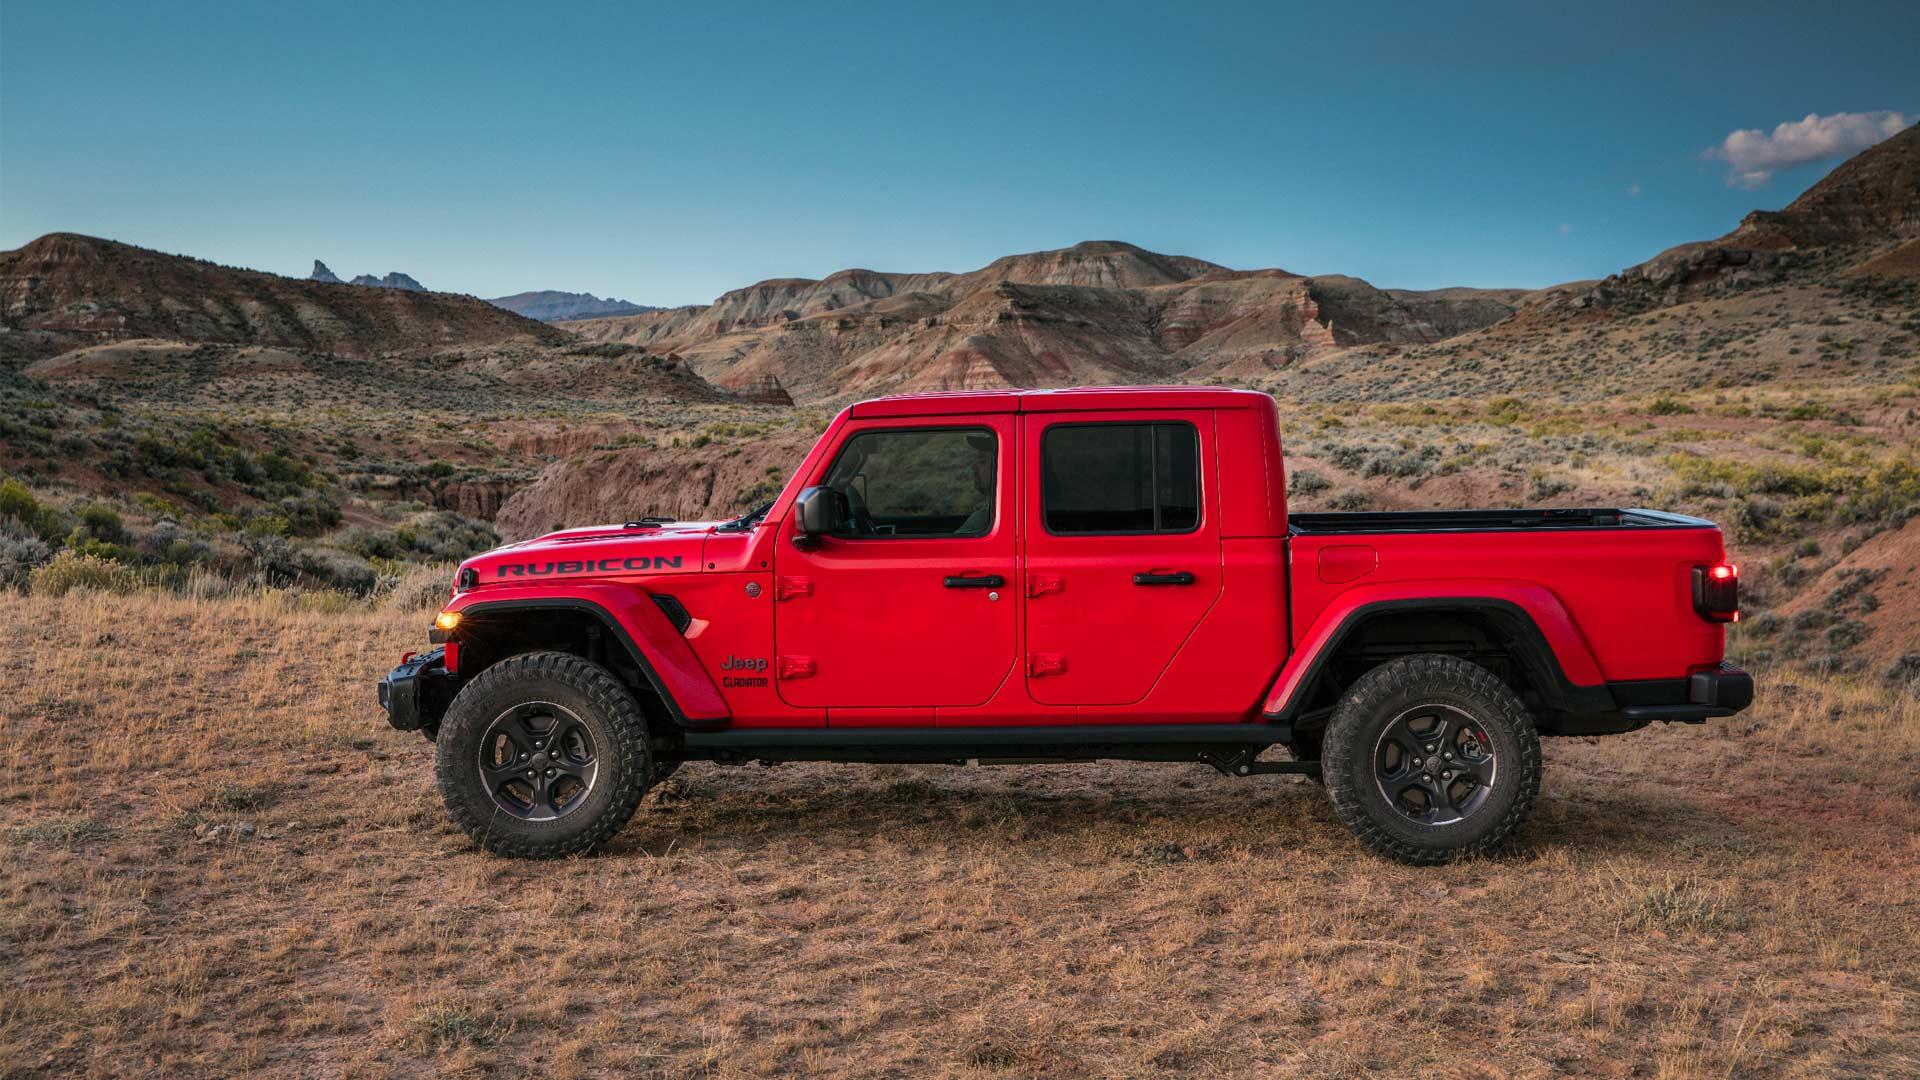 2020-Jeep-Gladiator-Rubicon_2